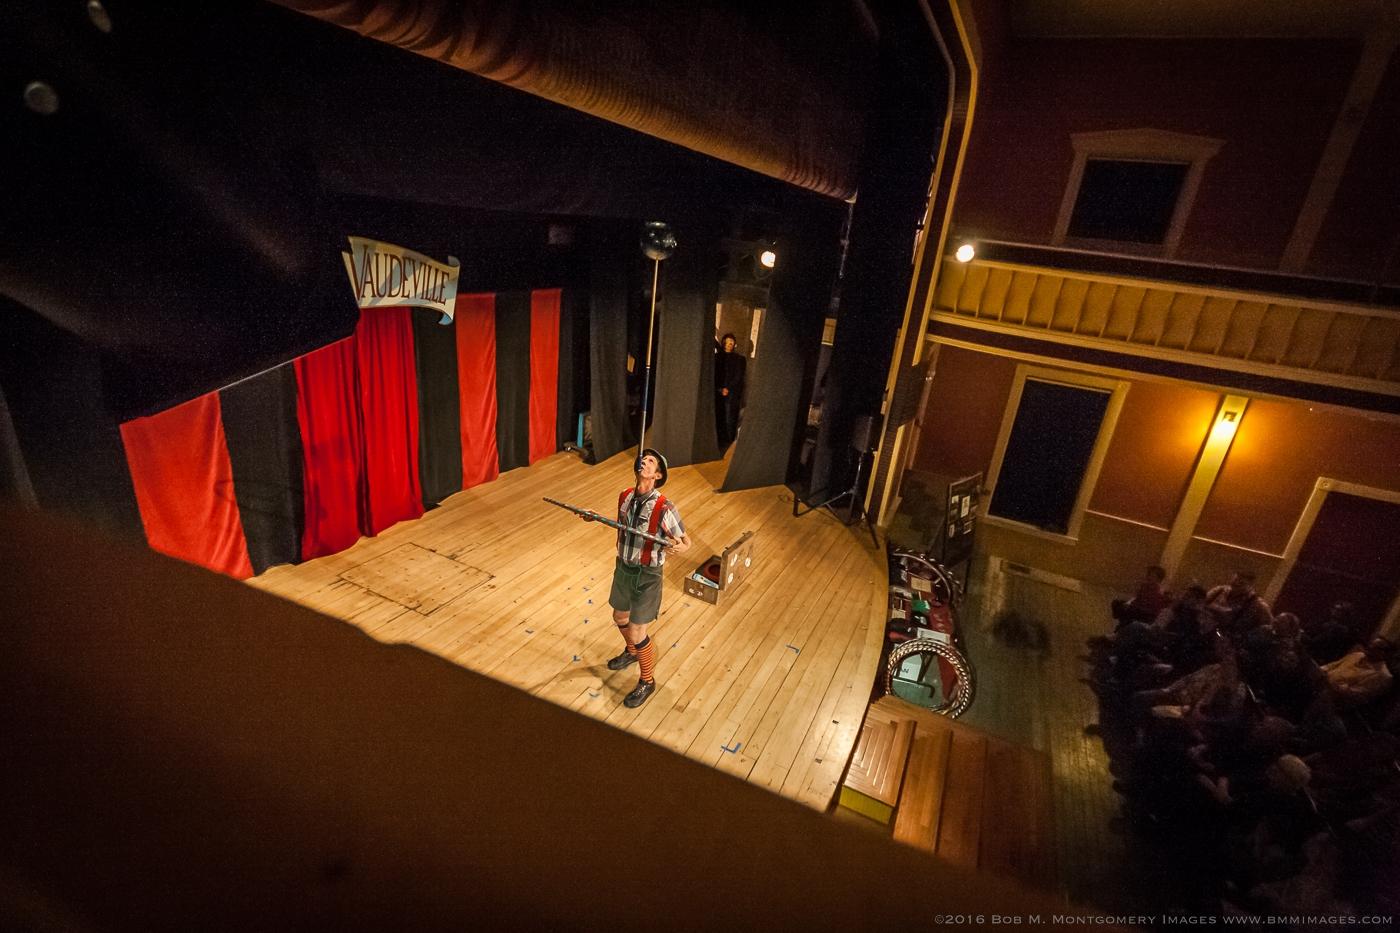 Vermont Vaudeville 20160513 - 0041.jpg